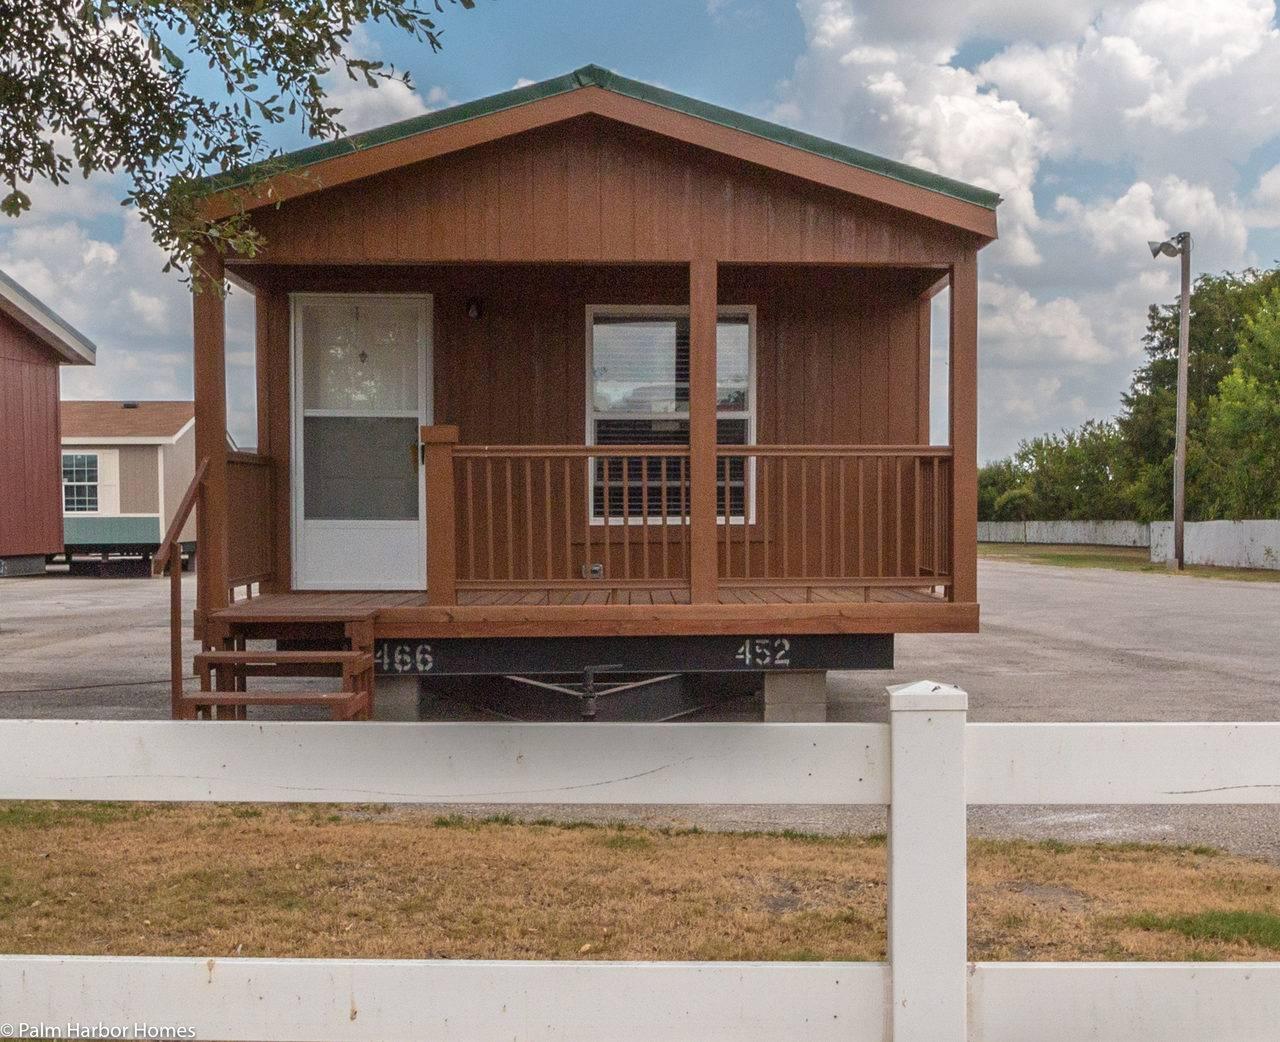 Cabana Iii Manufactured Home Floor Plans Mesquite